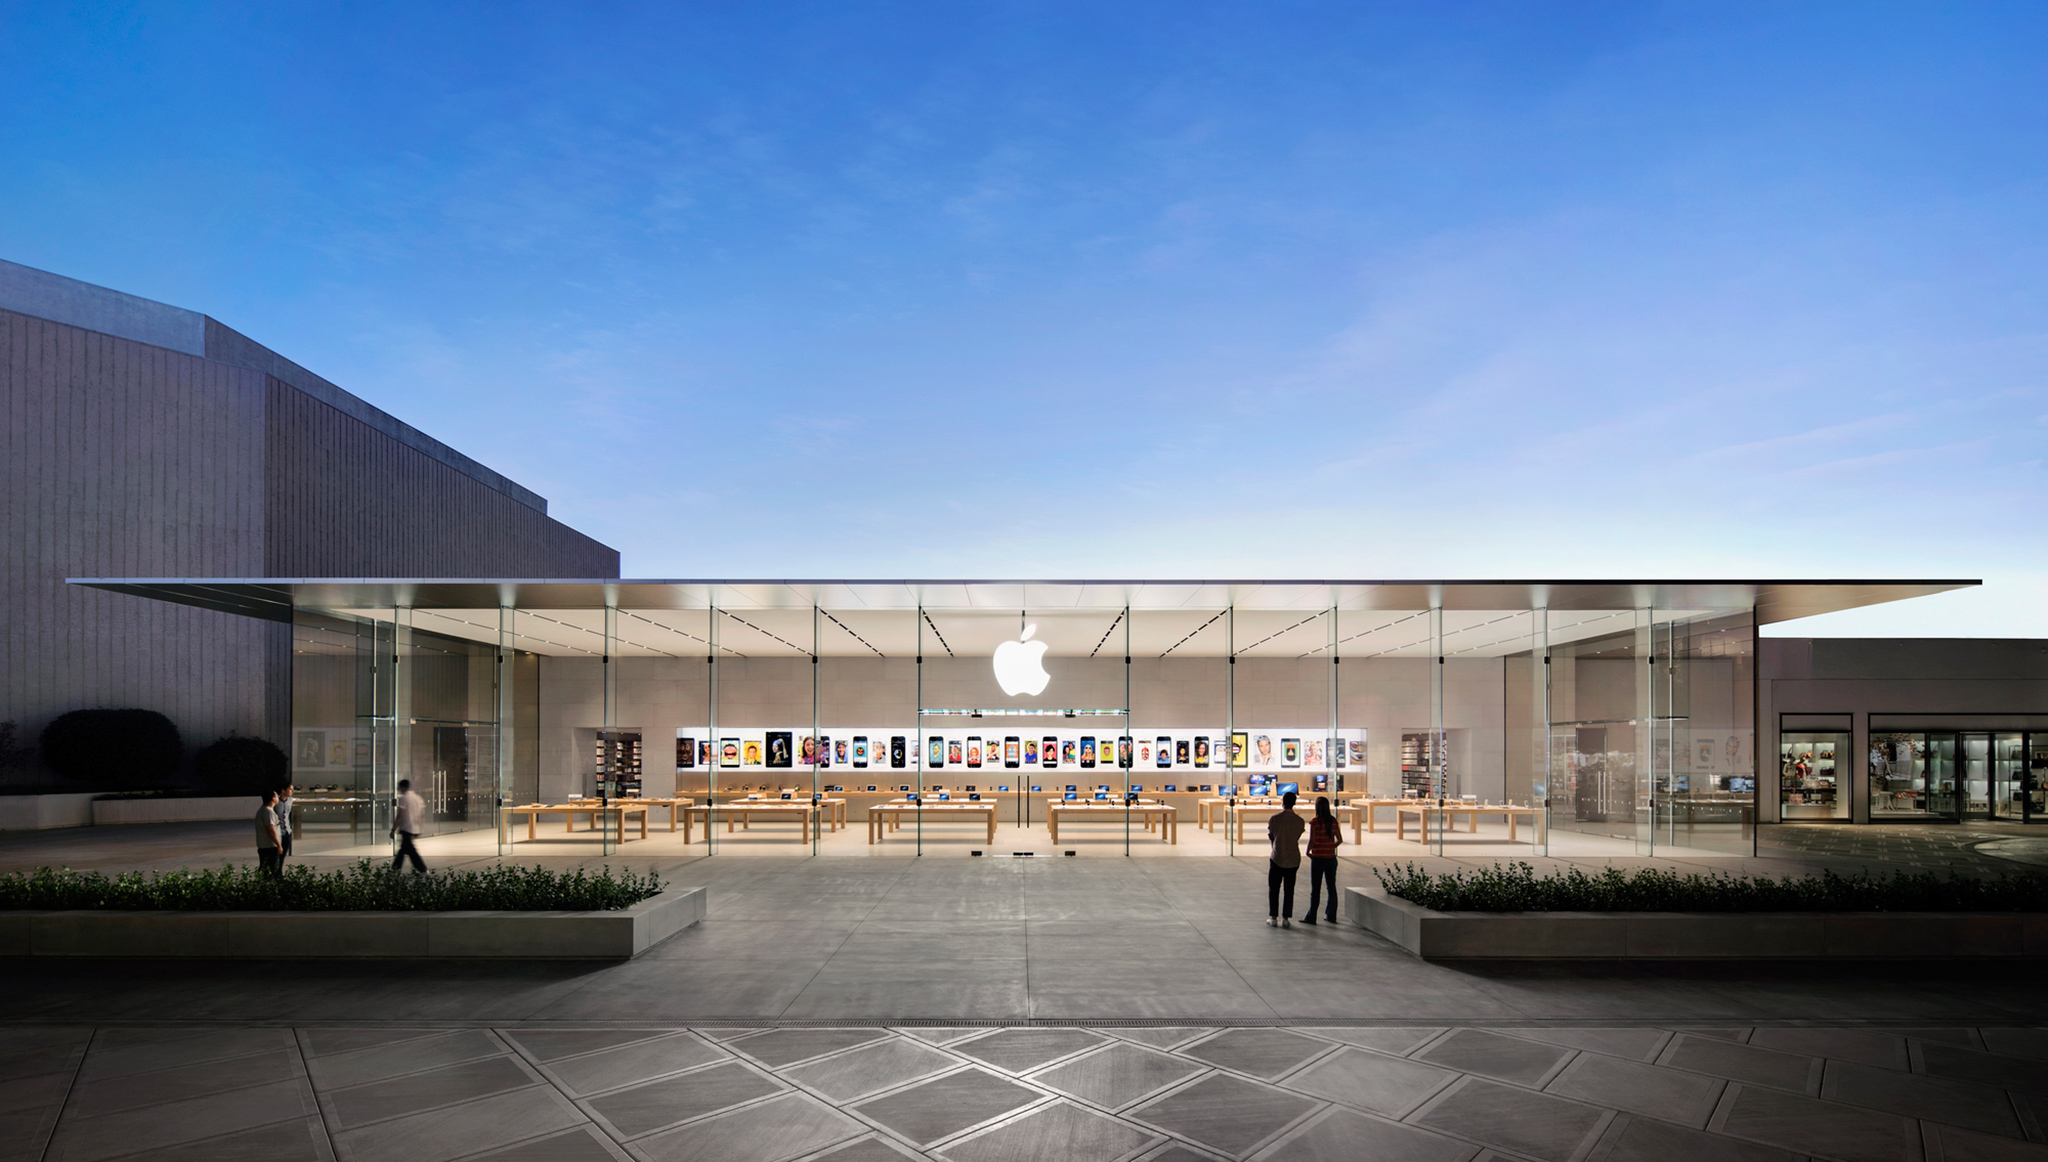 Silicon Valley Apple Store By Bohlin Cywinski Jackson